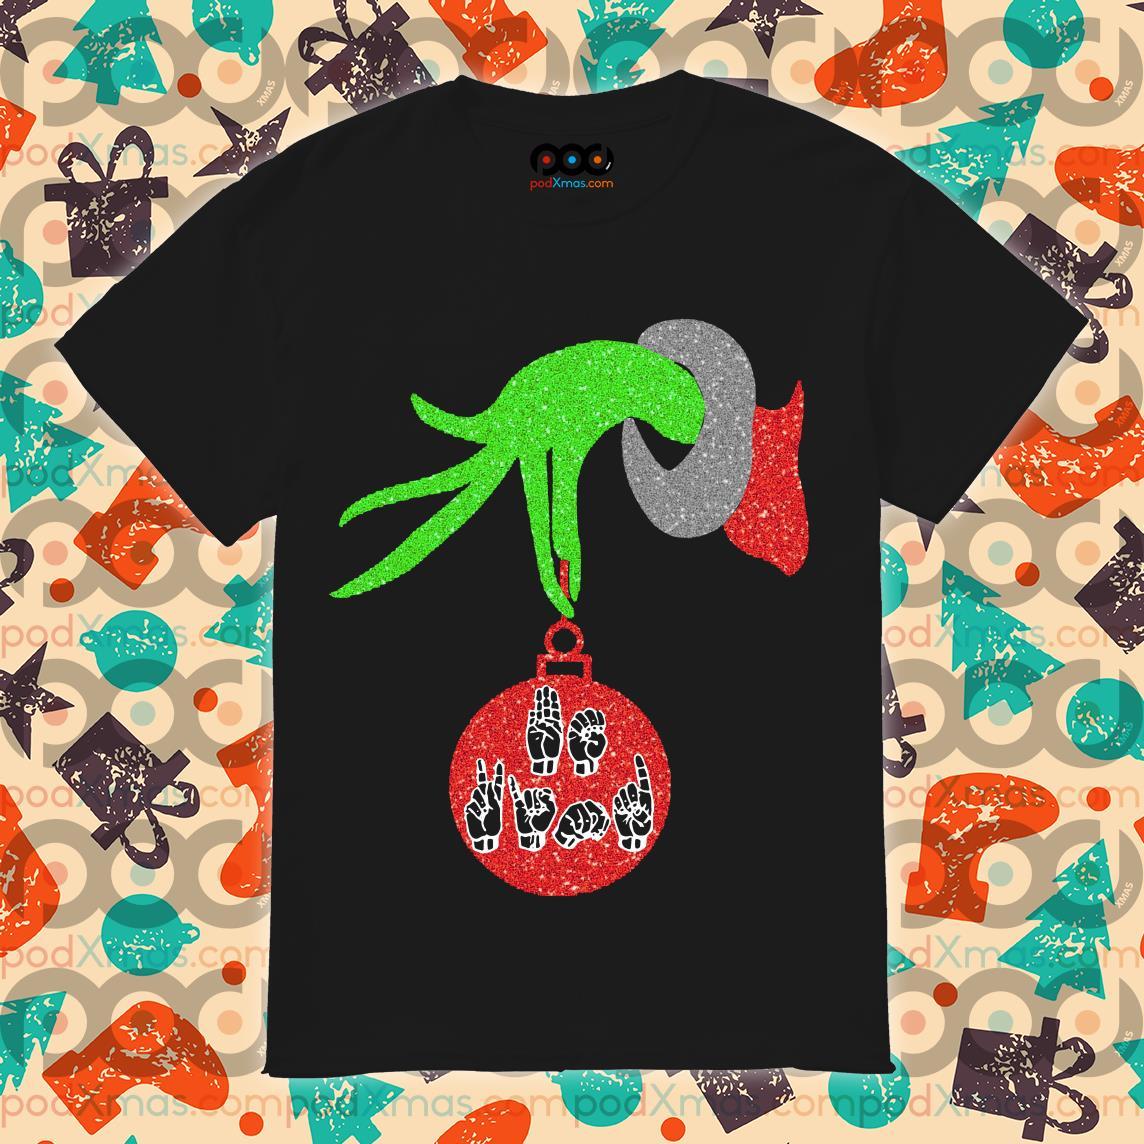 Grinch Sign language Christmas shirt